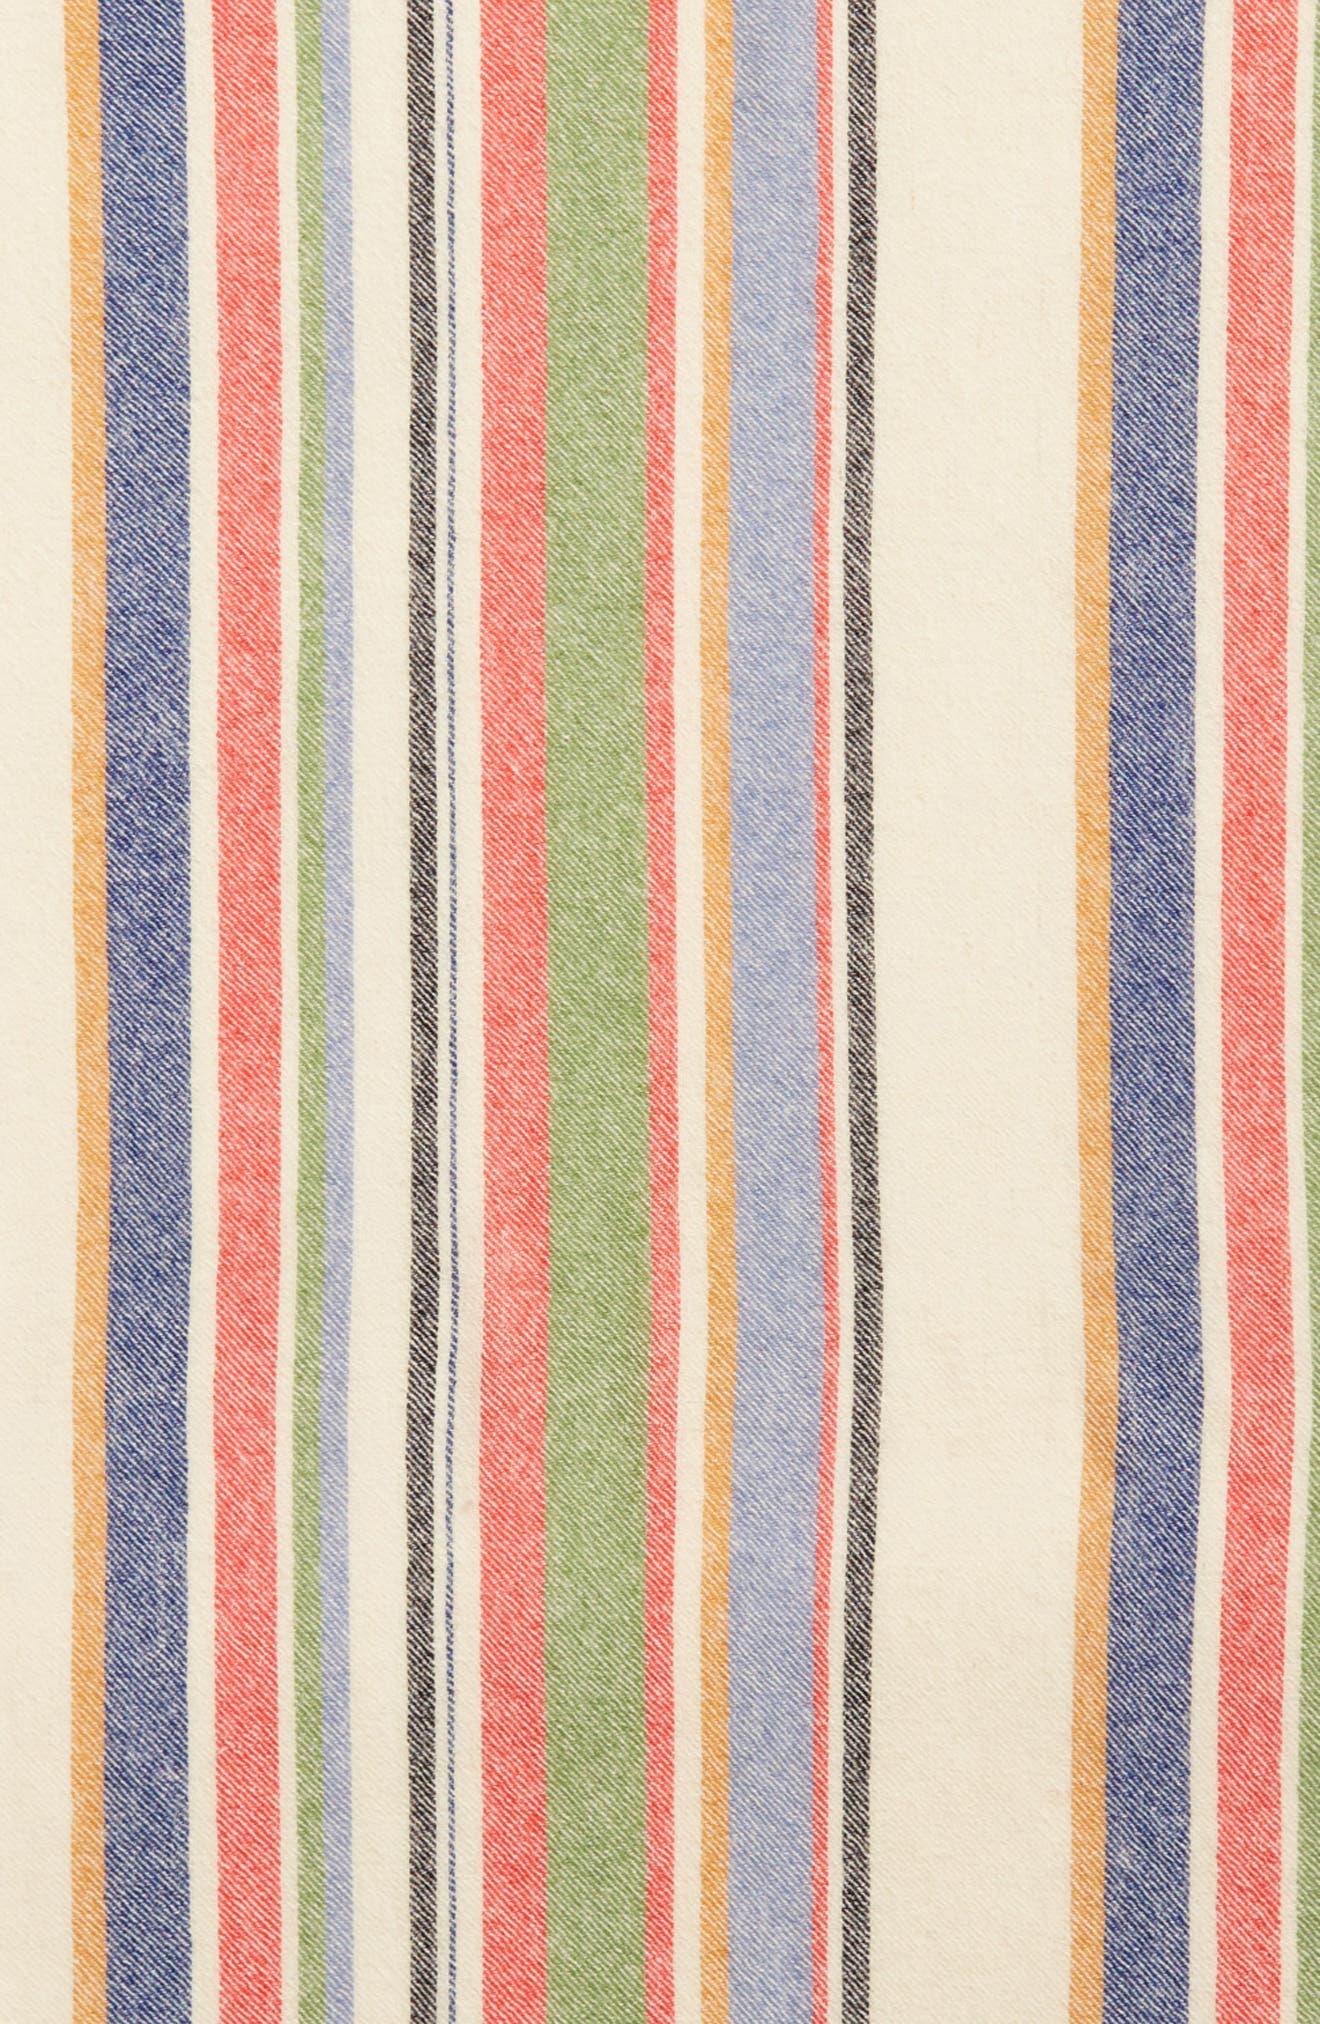 Alternate Image 4  - Standard Form Variance Wool & Cashmere Scarf